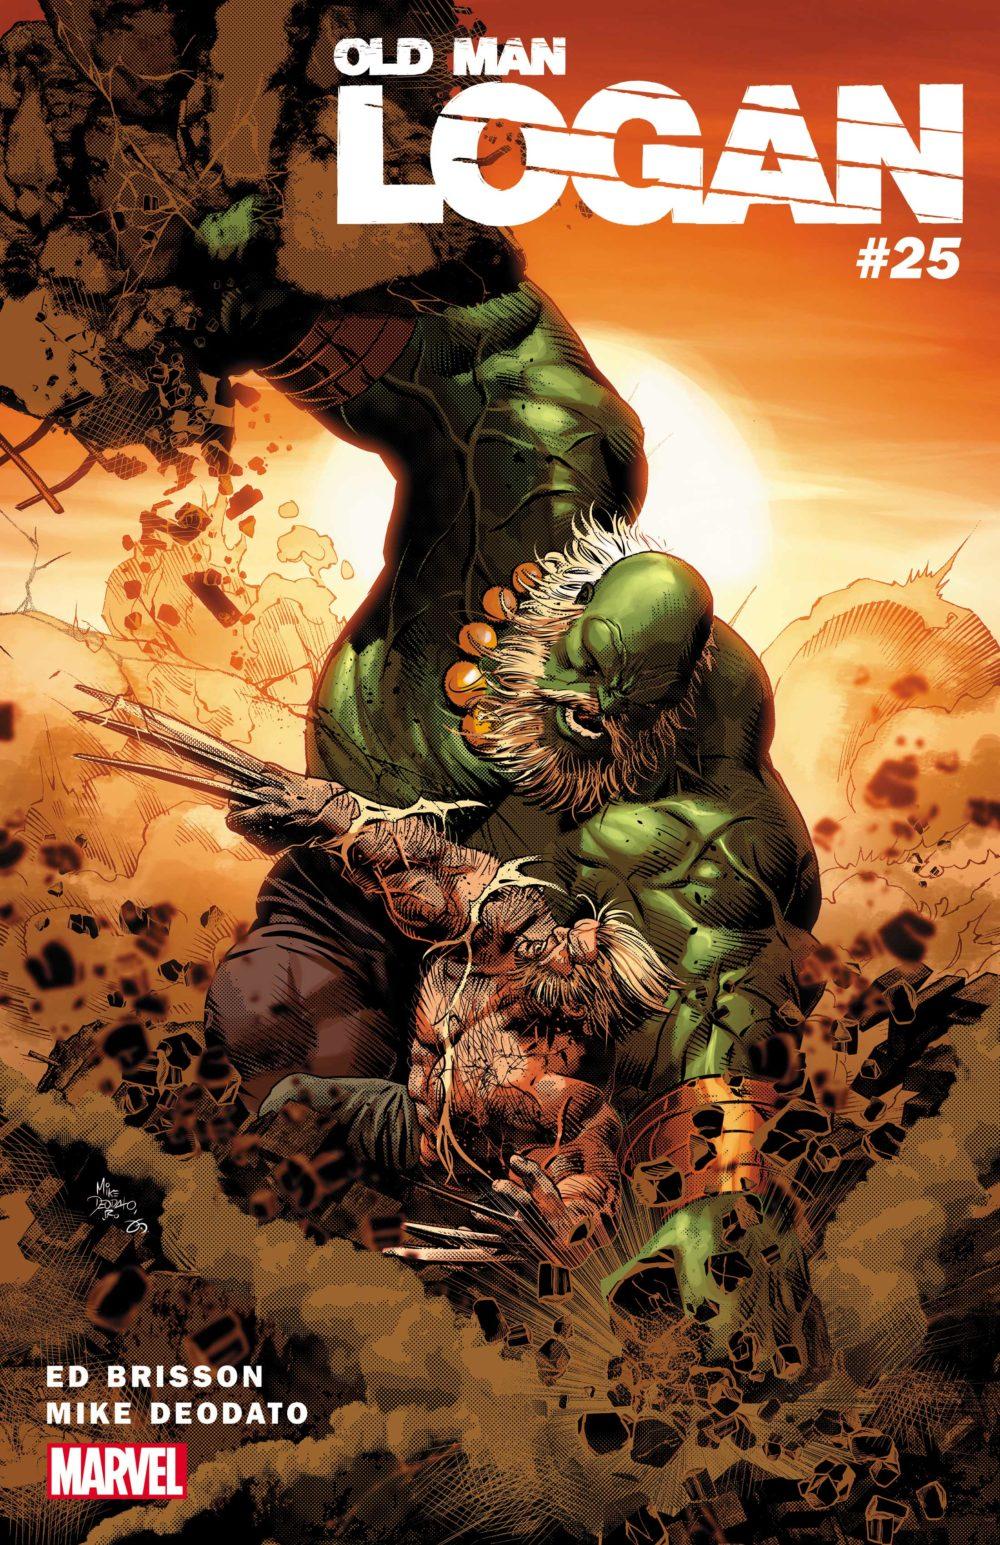 Wolverine vs. Hulk As You've Never Seen Before in OLD MAN LOGAN #25!